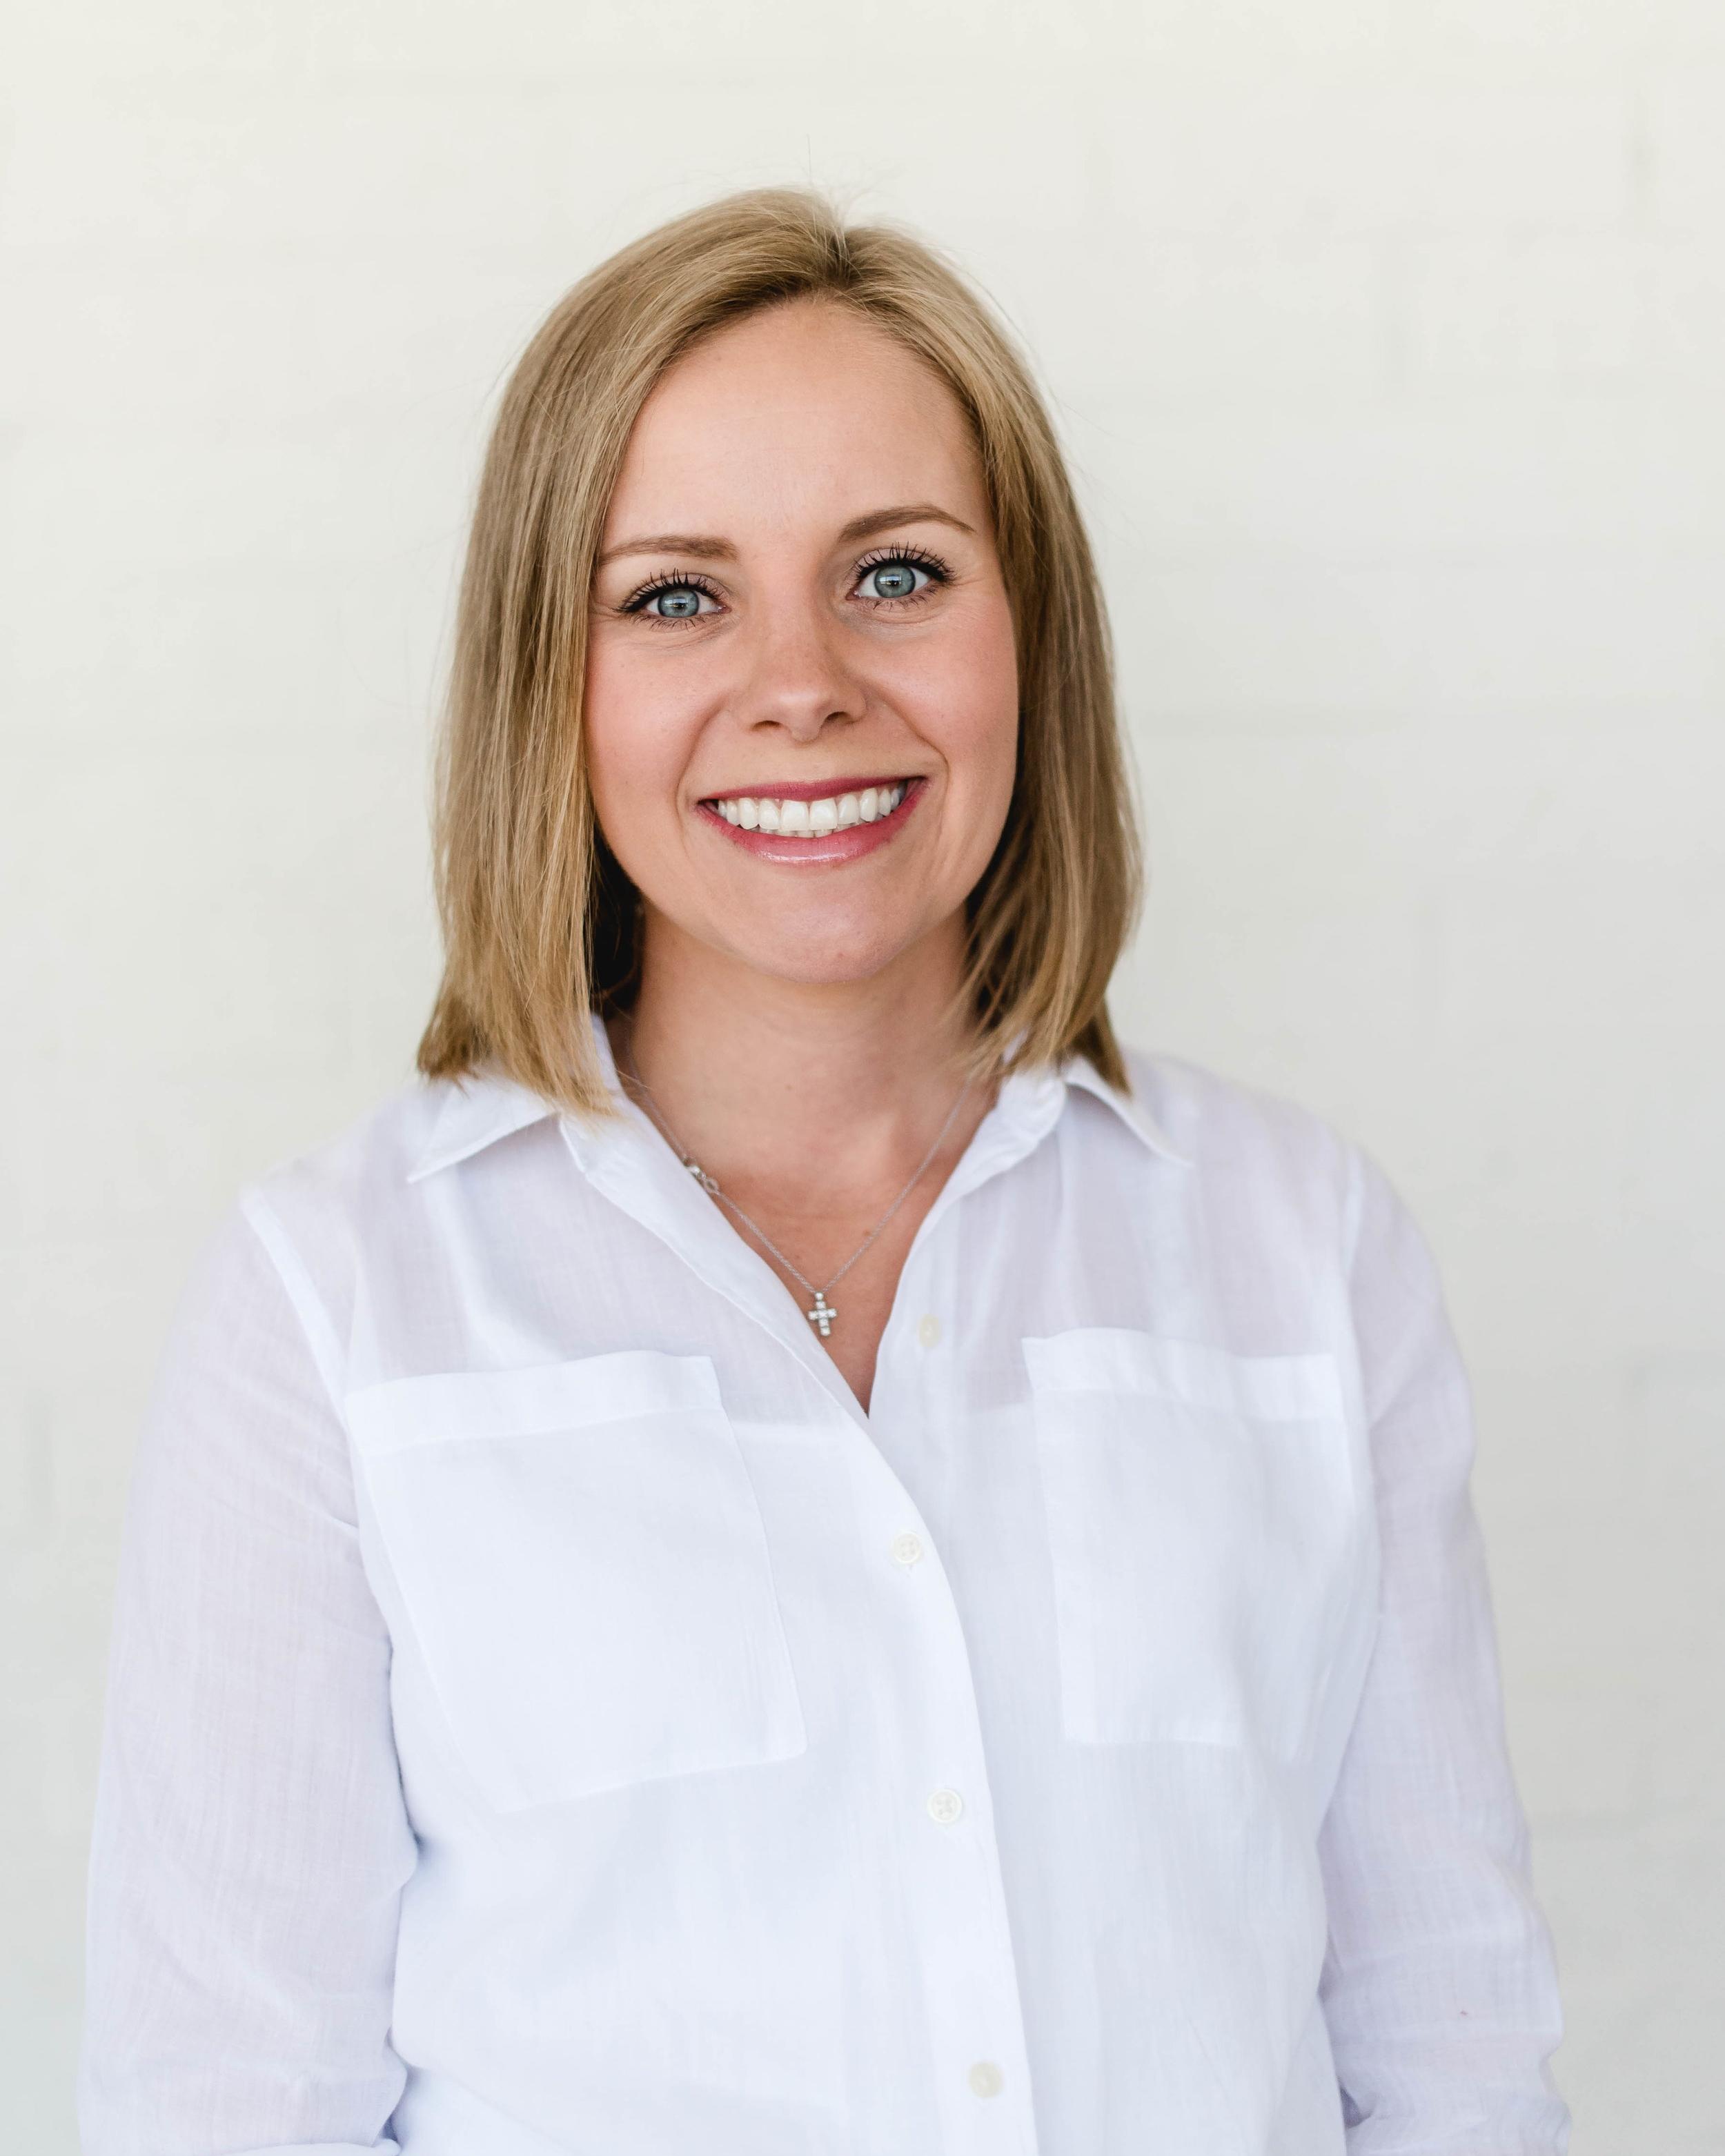 Katelyn Edwards - Real Estate Agent817.404.2104katelyn@highstreethomes.com